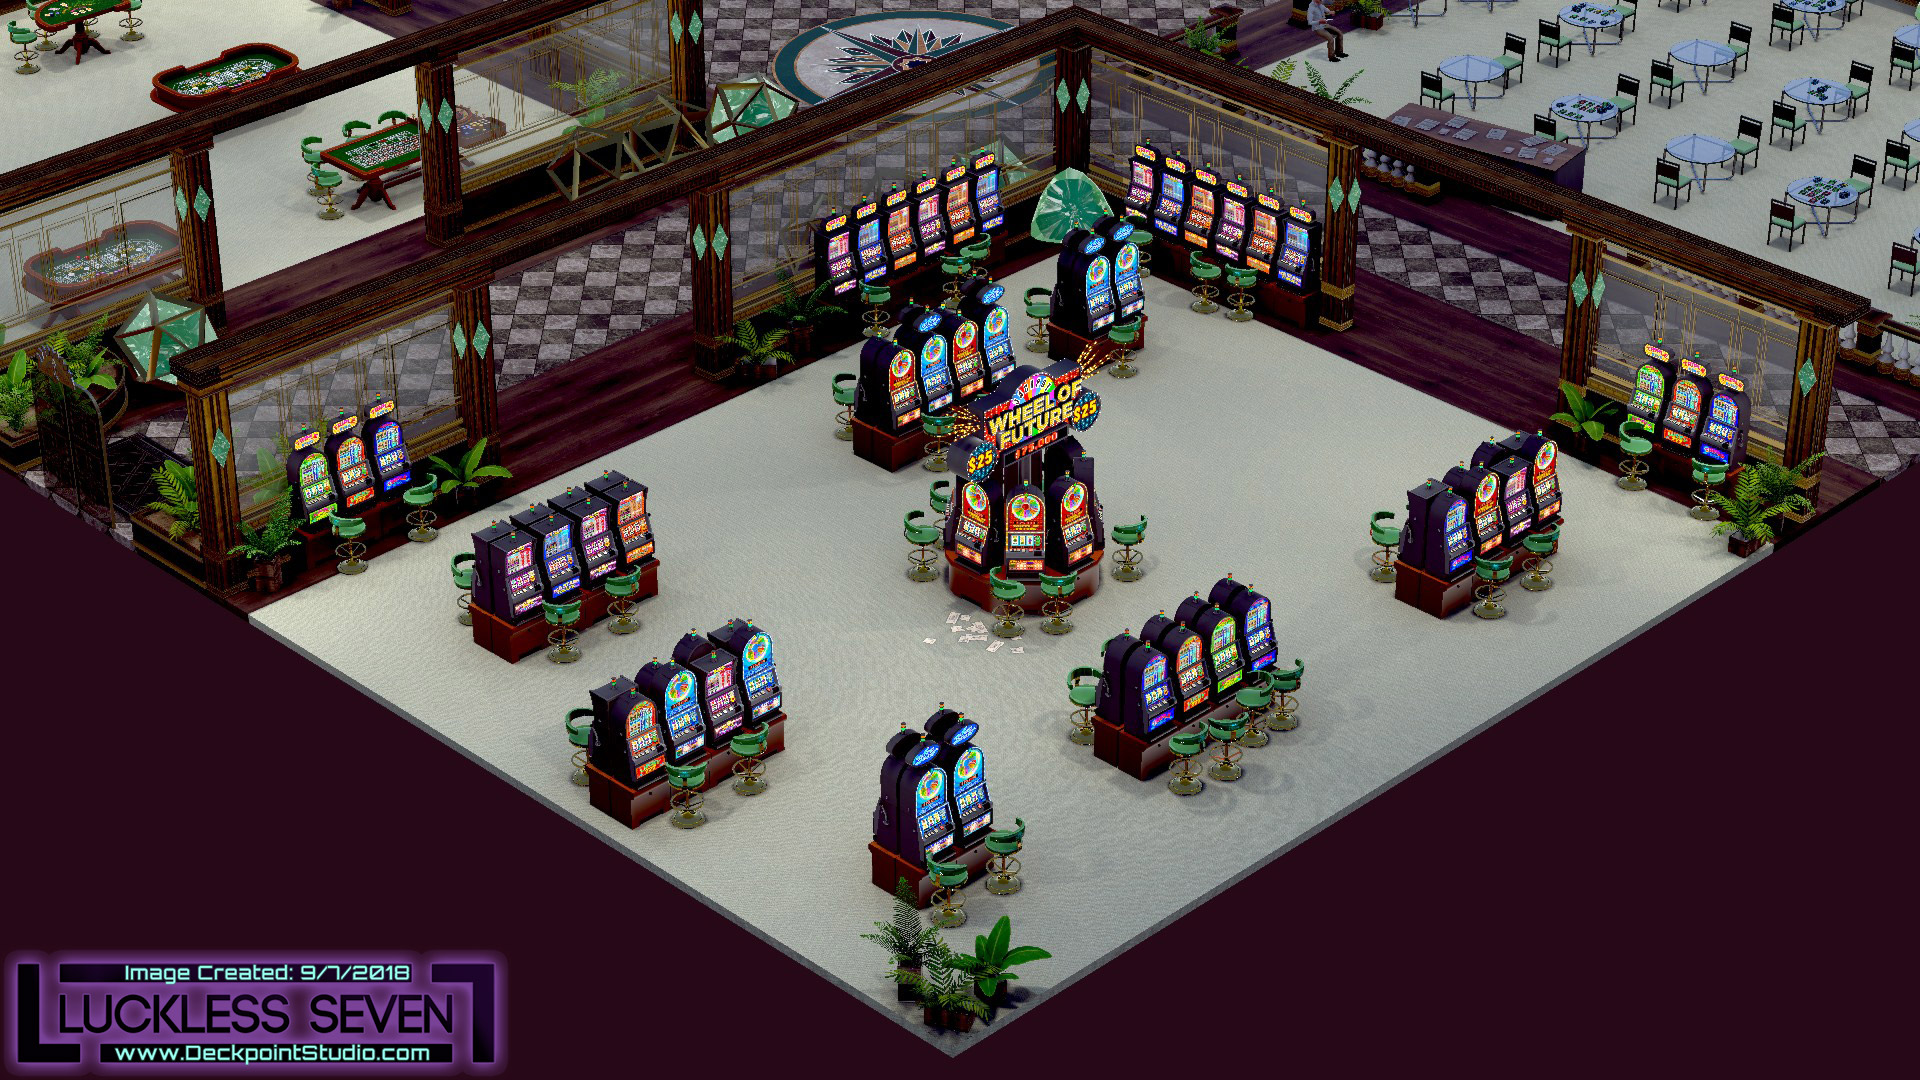 Emerald Casino Interior Luckless